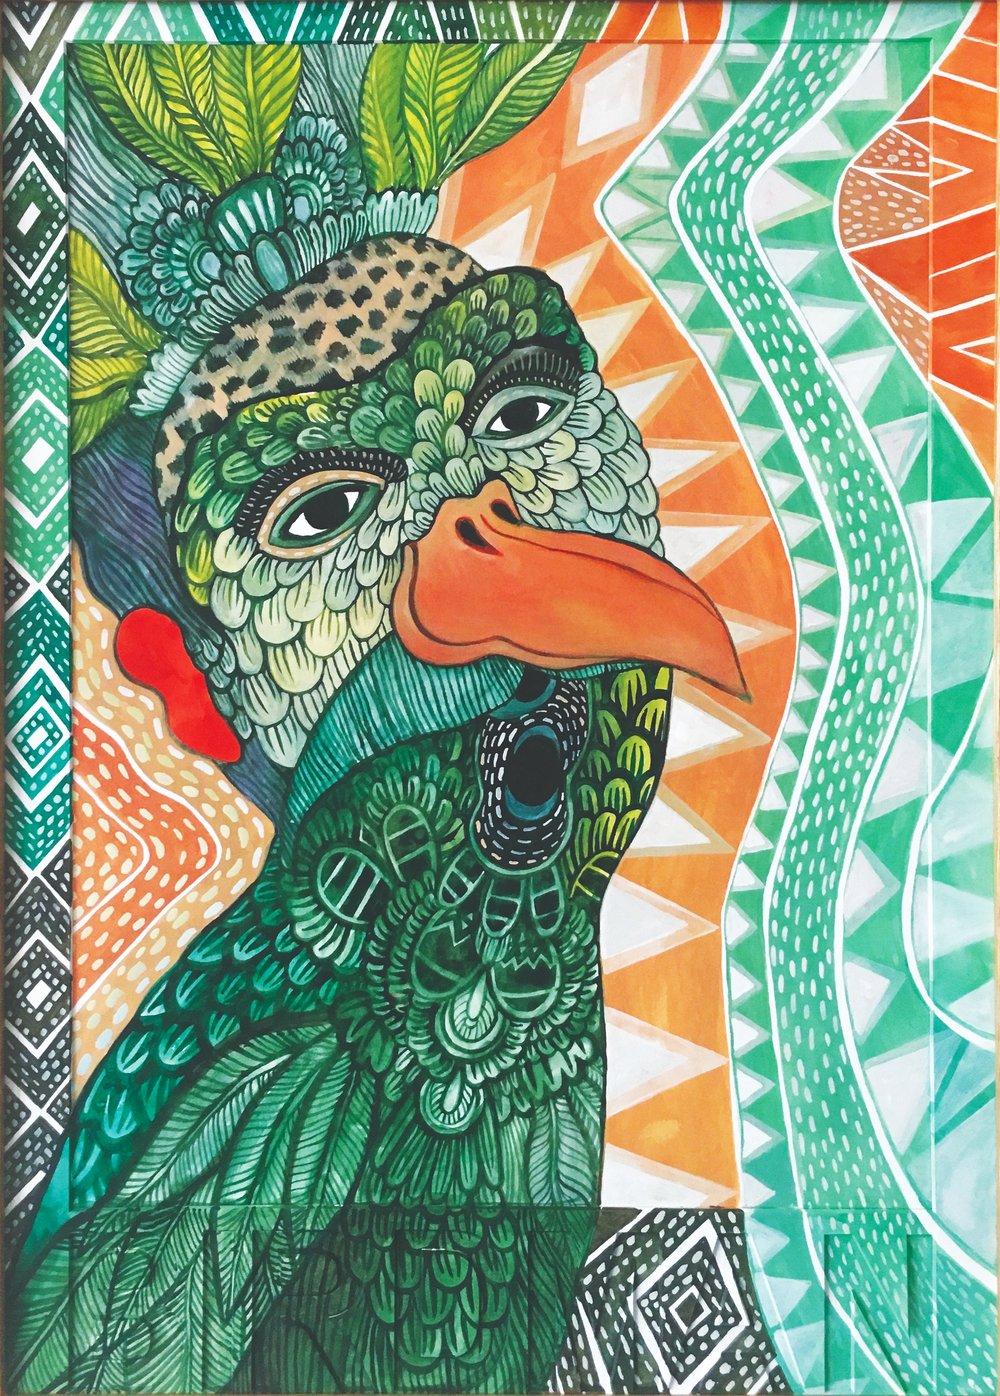 CECILIA FOGELBERG  BIRDMAN (green) , 2019 gouache and watercolour on 100% cotton rag board, framed 61 x 43 cm